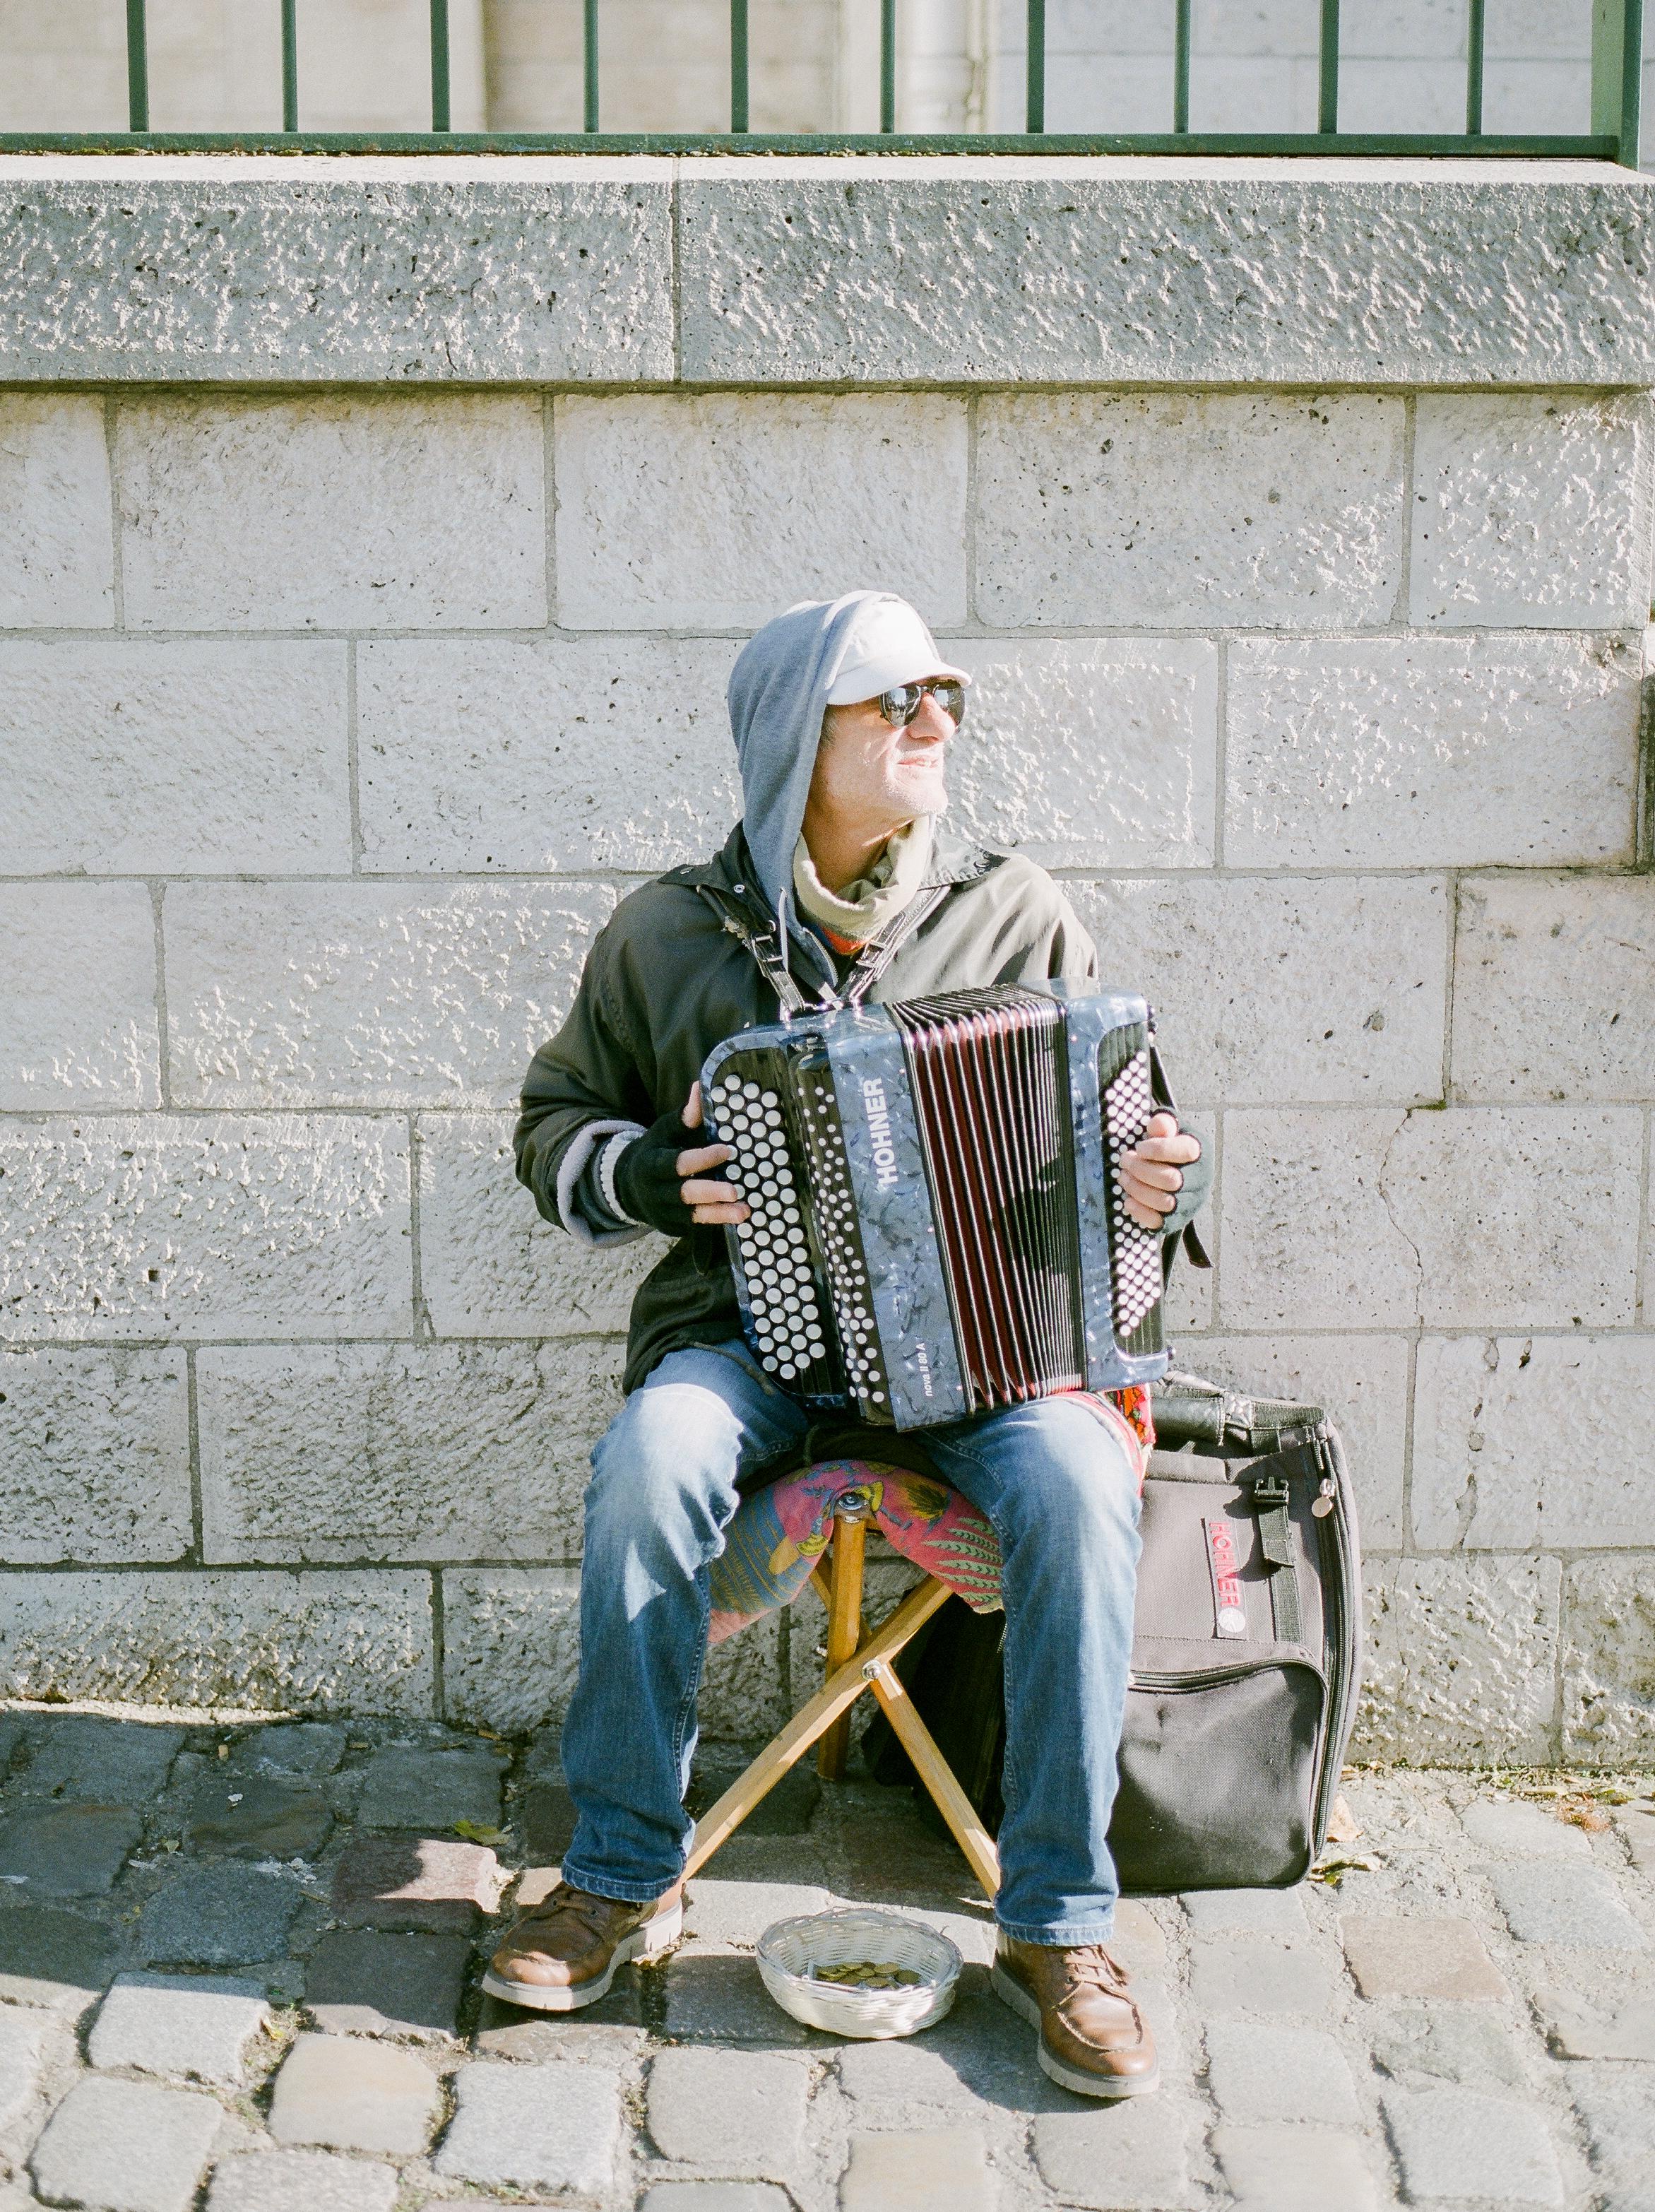 paris-lifestyle-travel-photographer-77.jpg